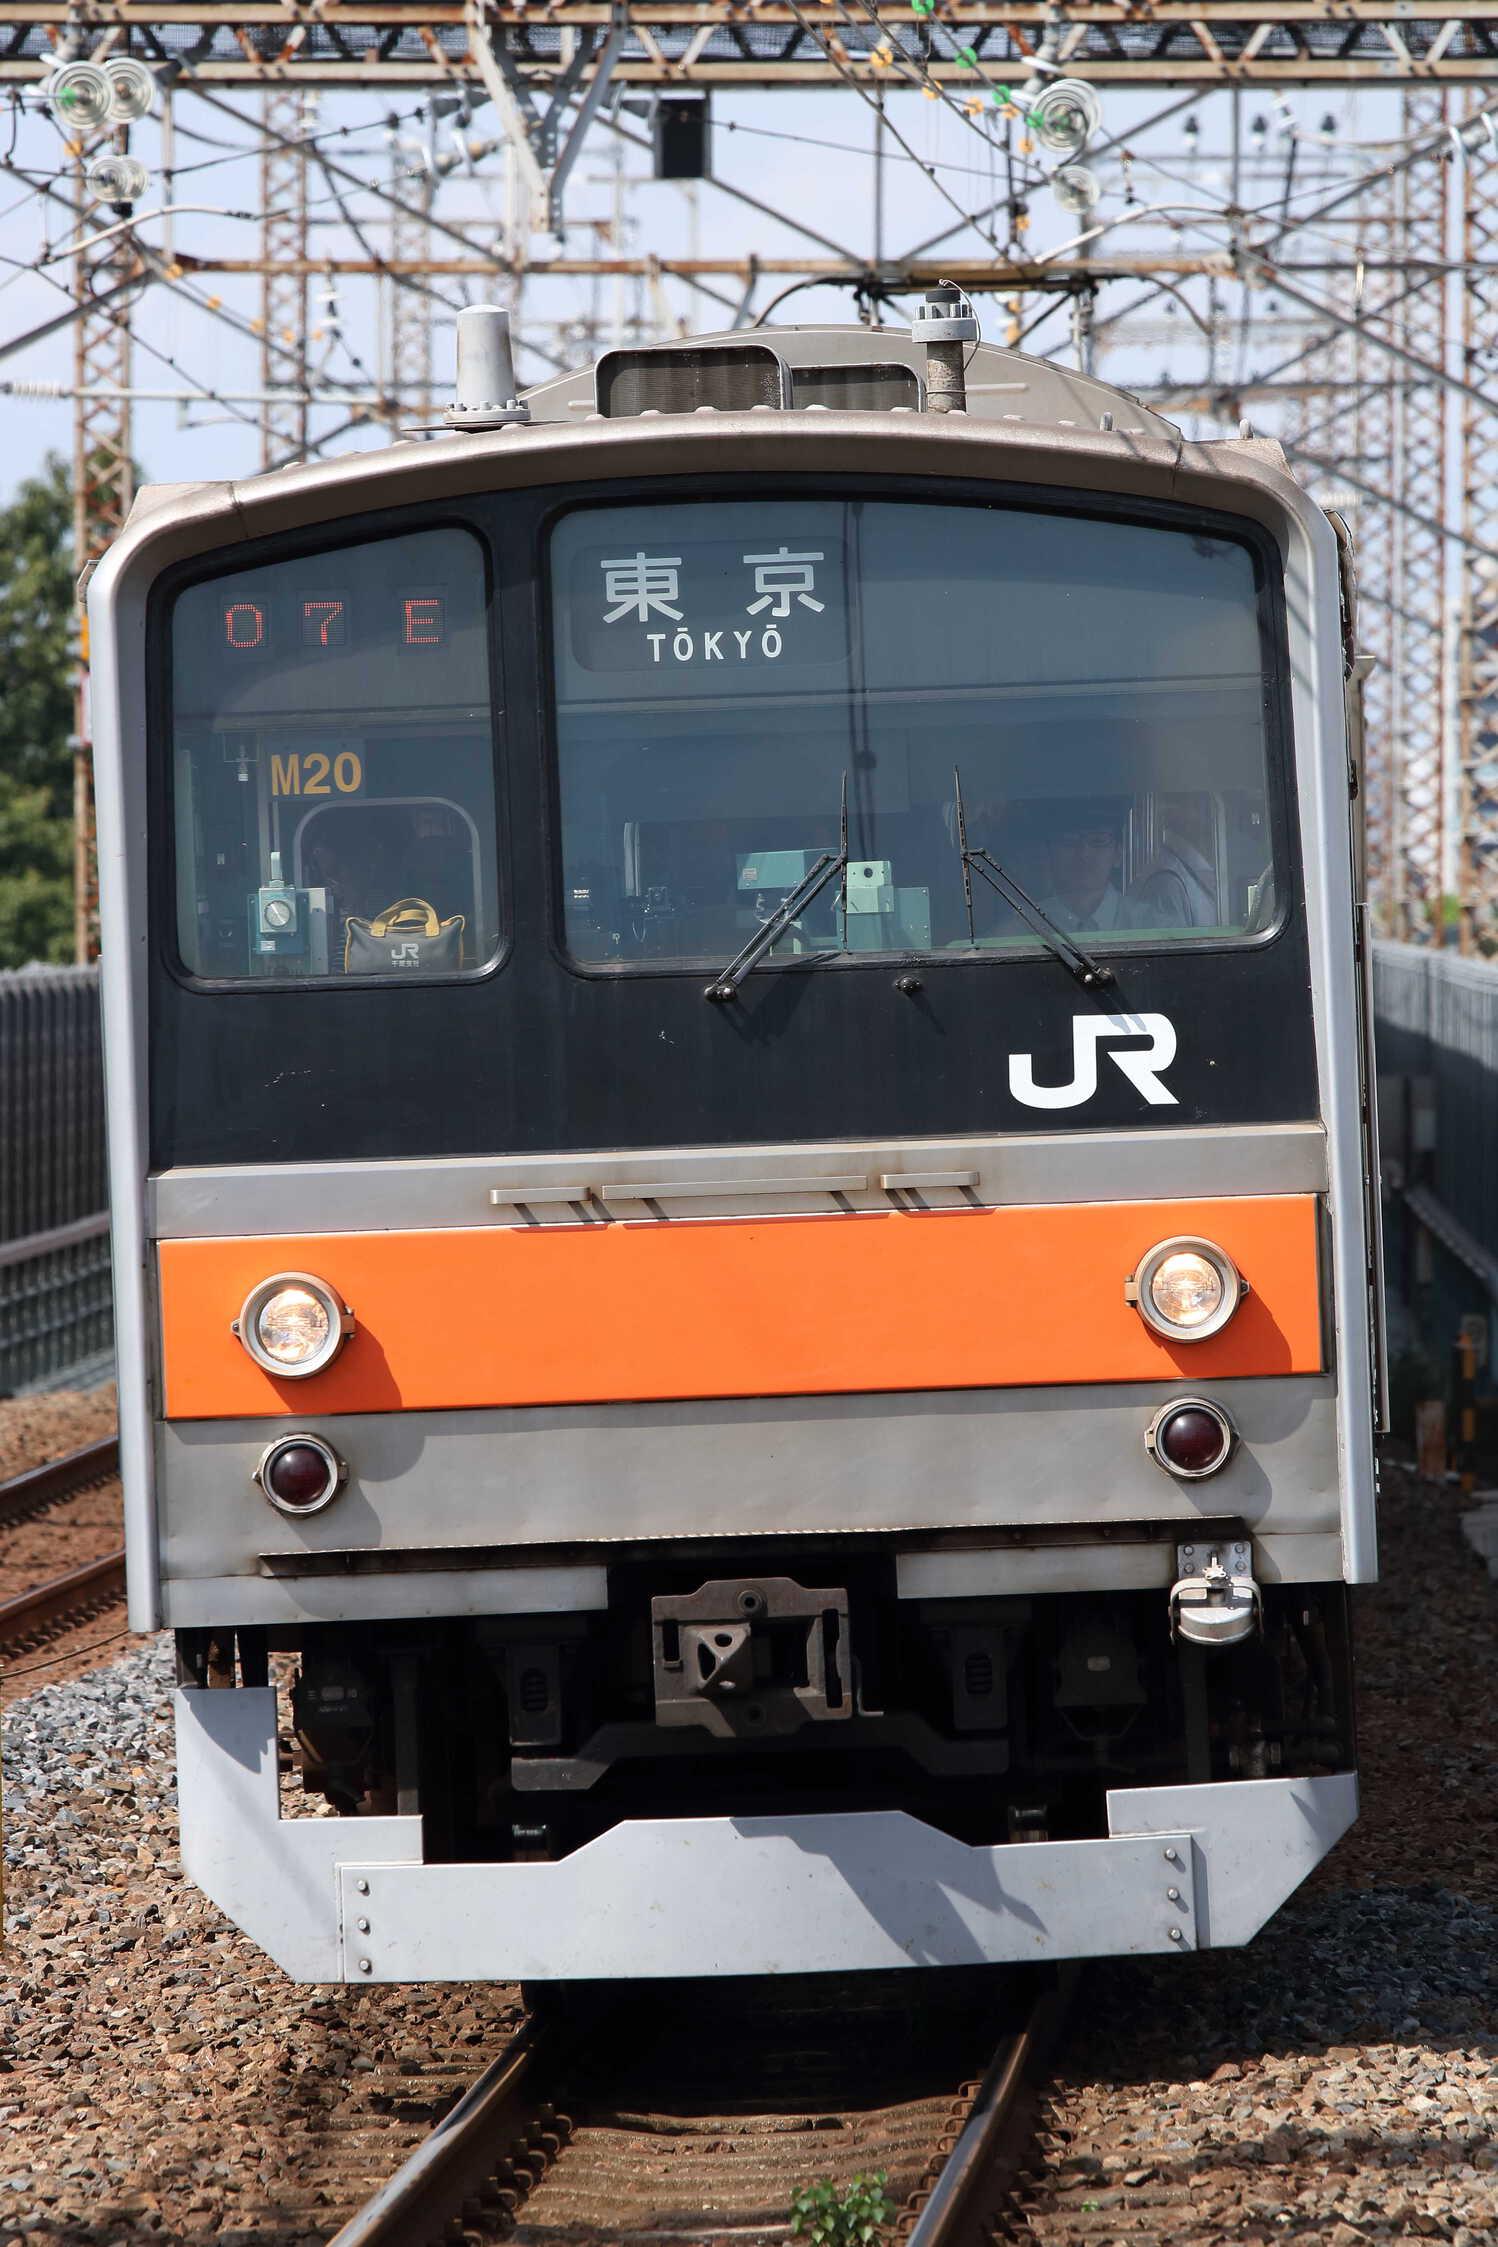 907E 205系 千ケヨM20編成